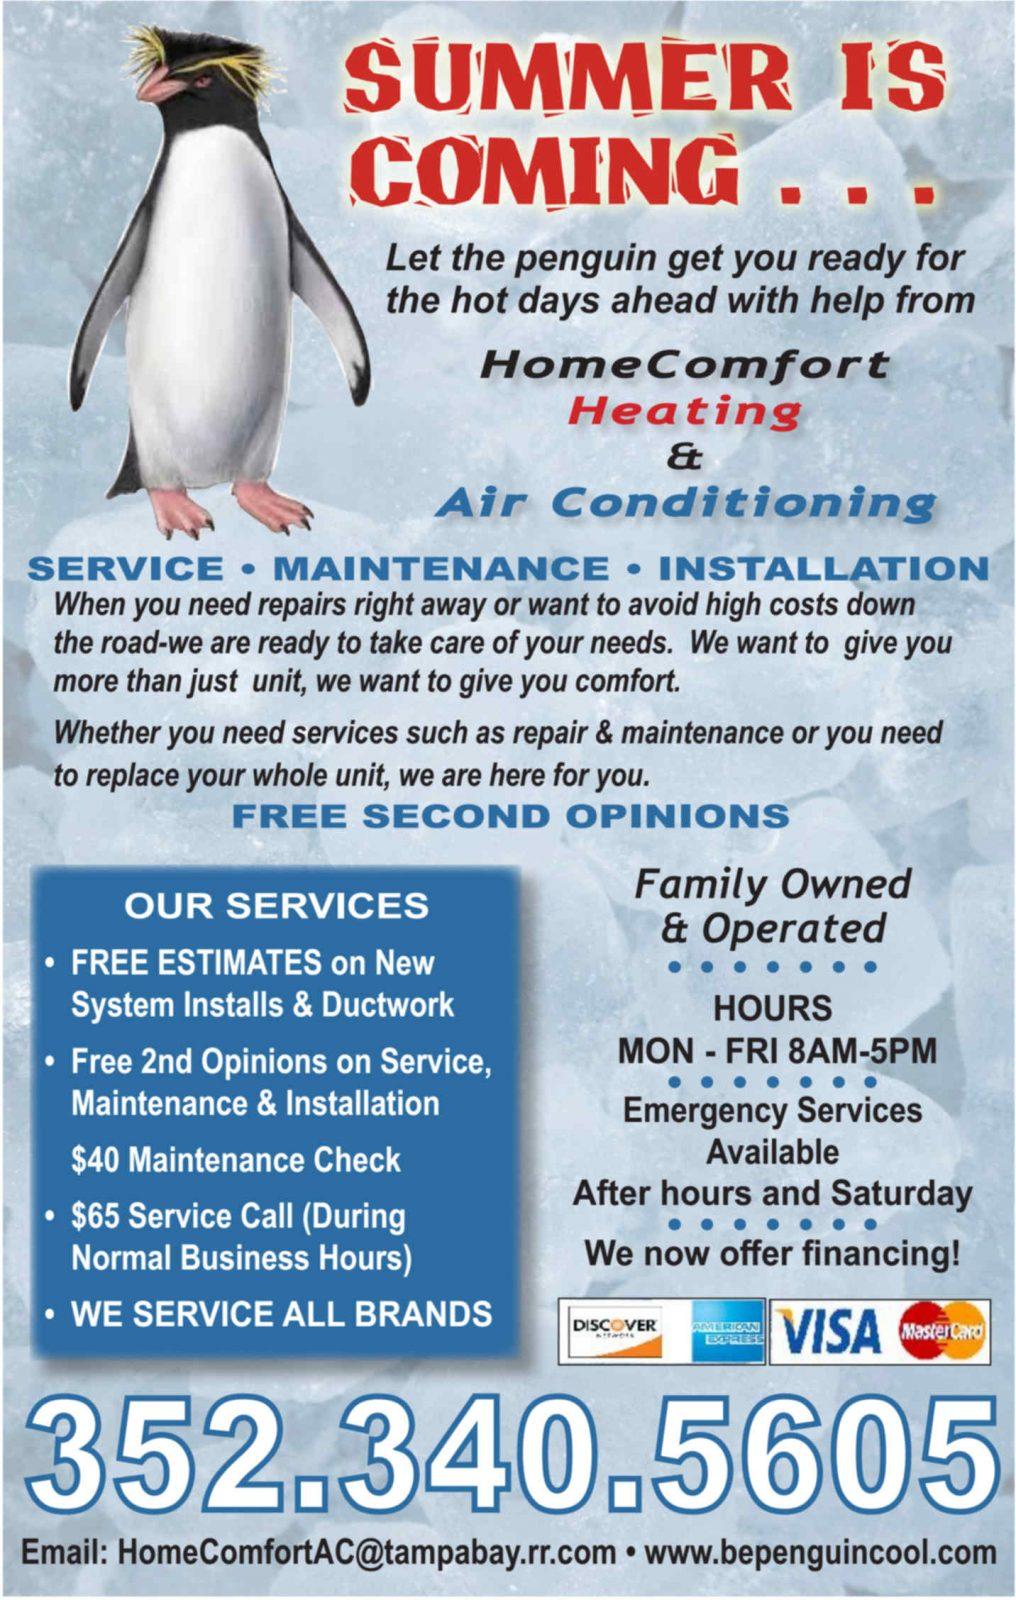 Home Comfort AC